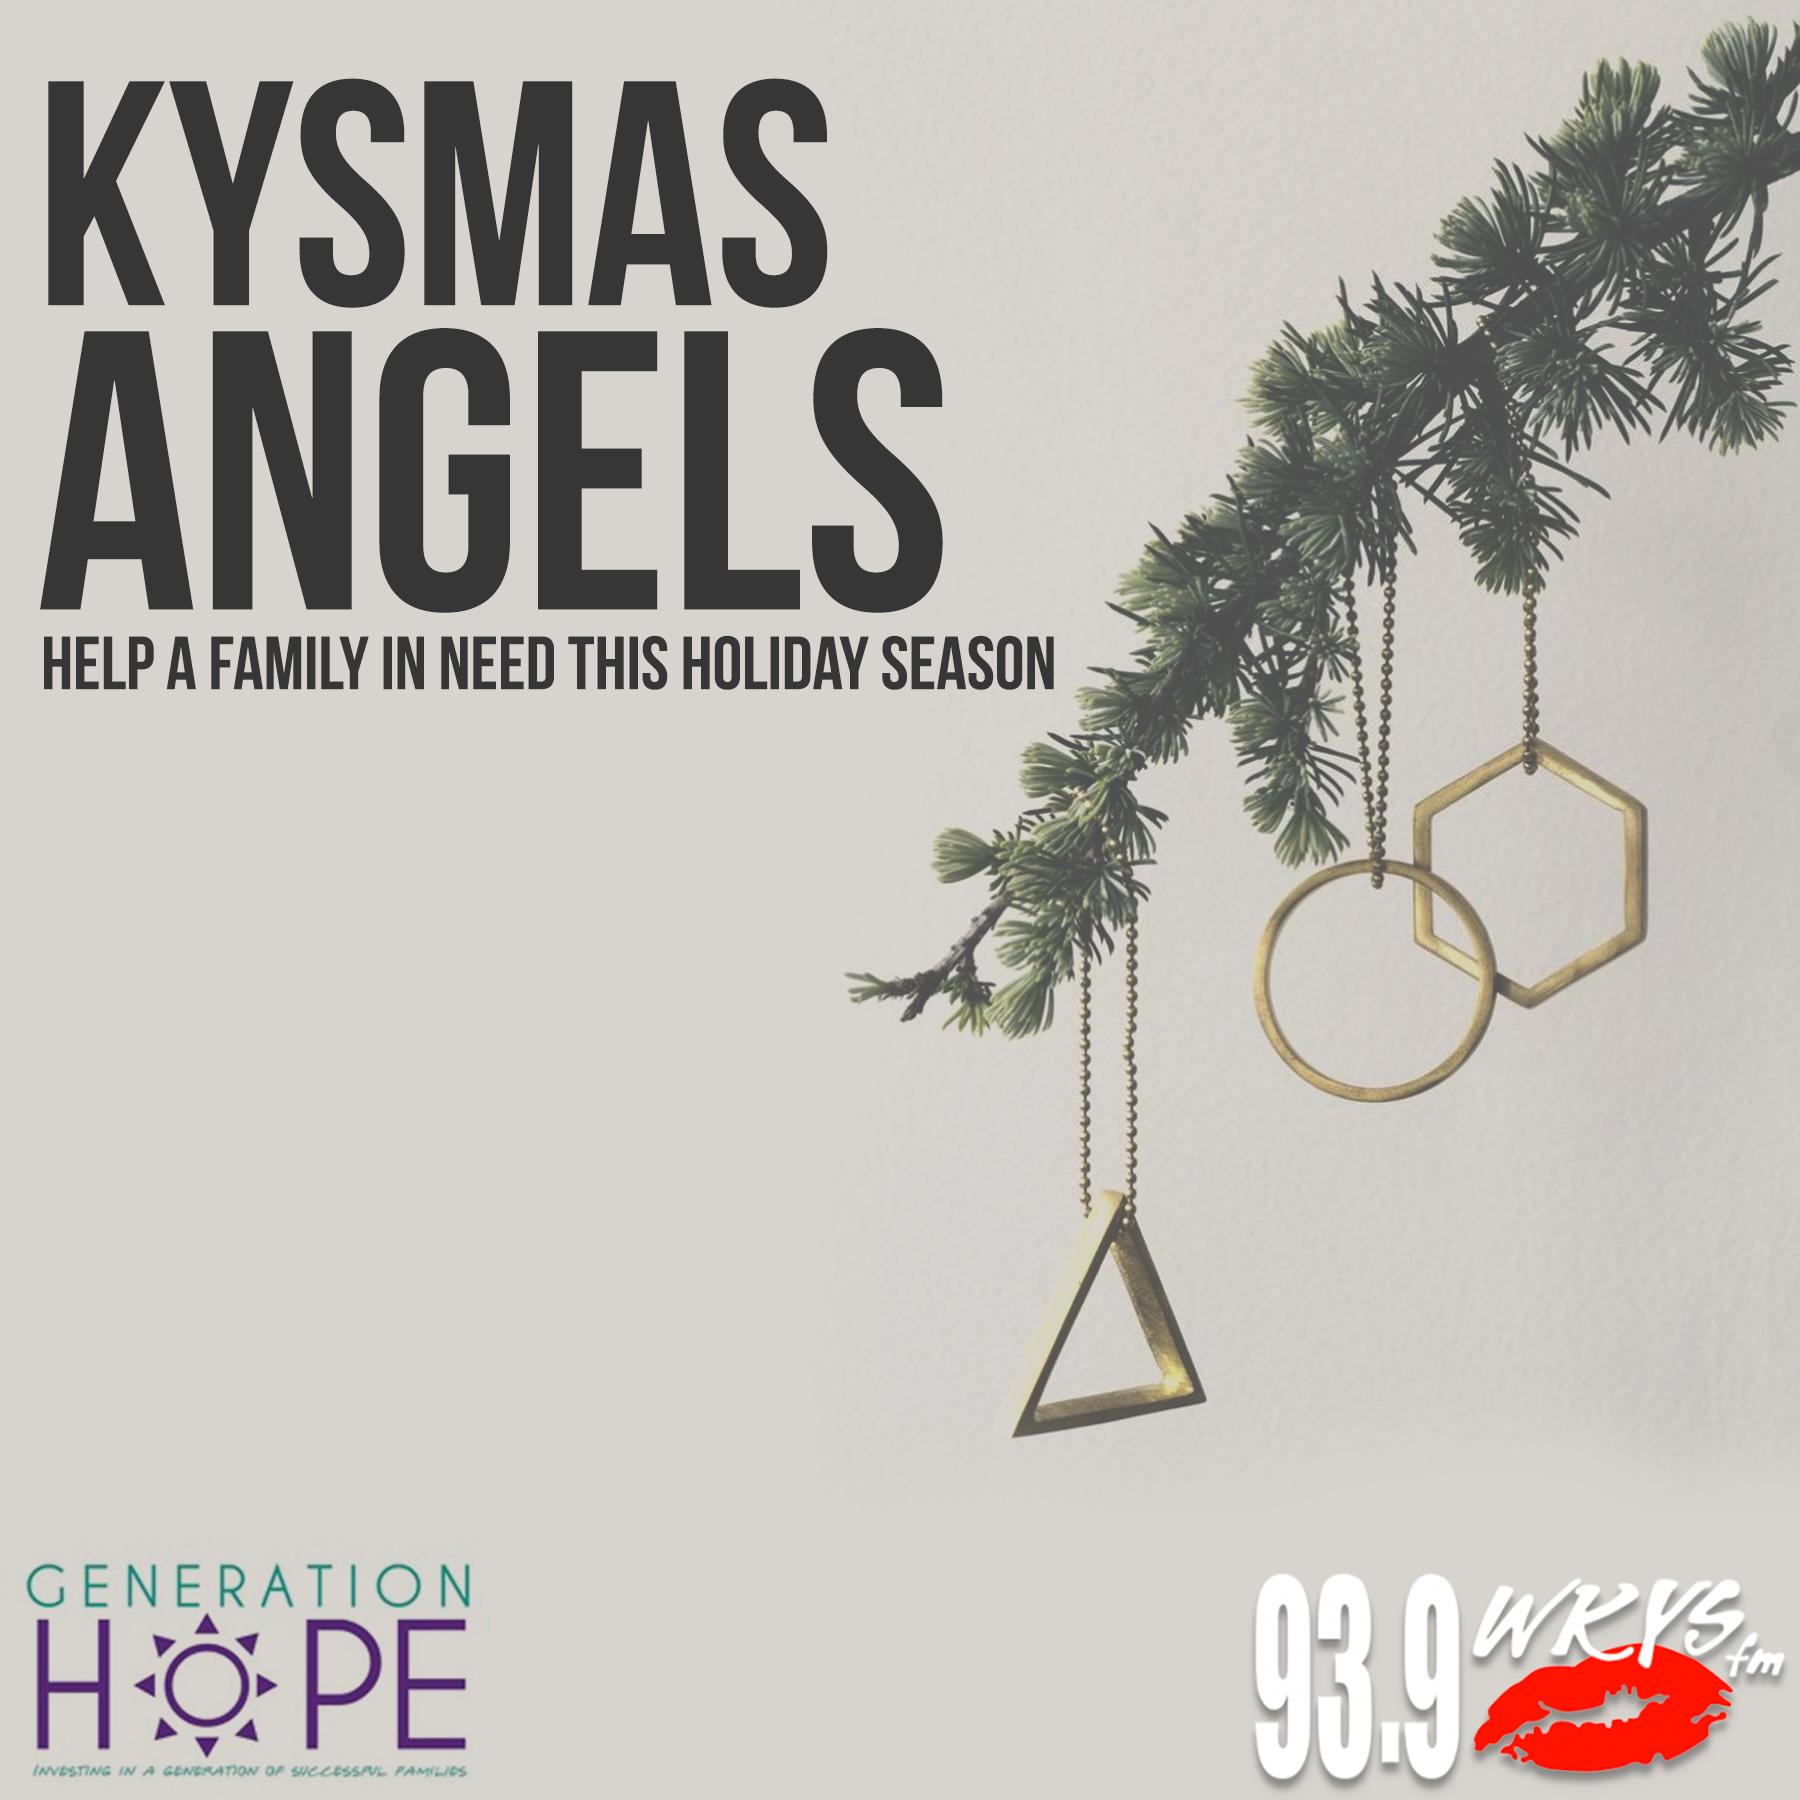 KYSMAS Angels